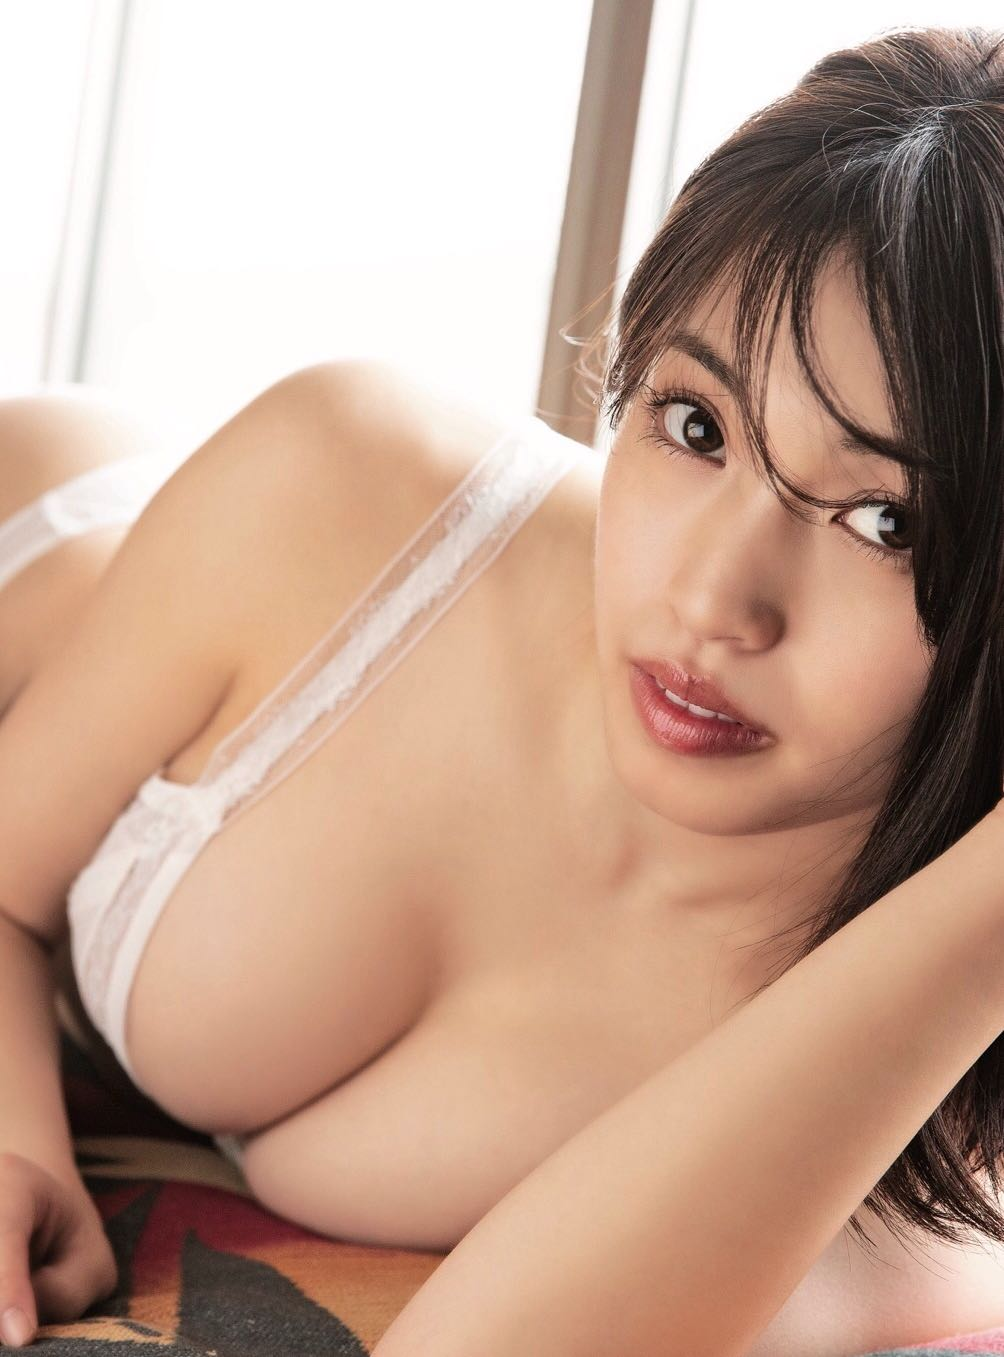 CHERRSEE・MIYU、話題のFカップ歌姫の1st写真集リリース決定!オファー理由は「天真爛漫な色気」